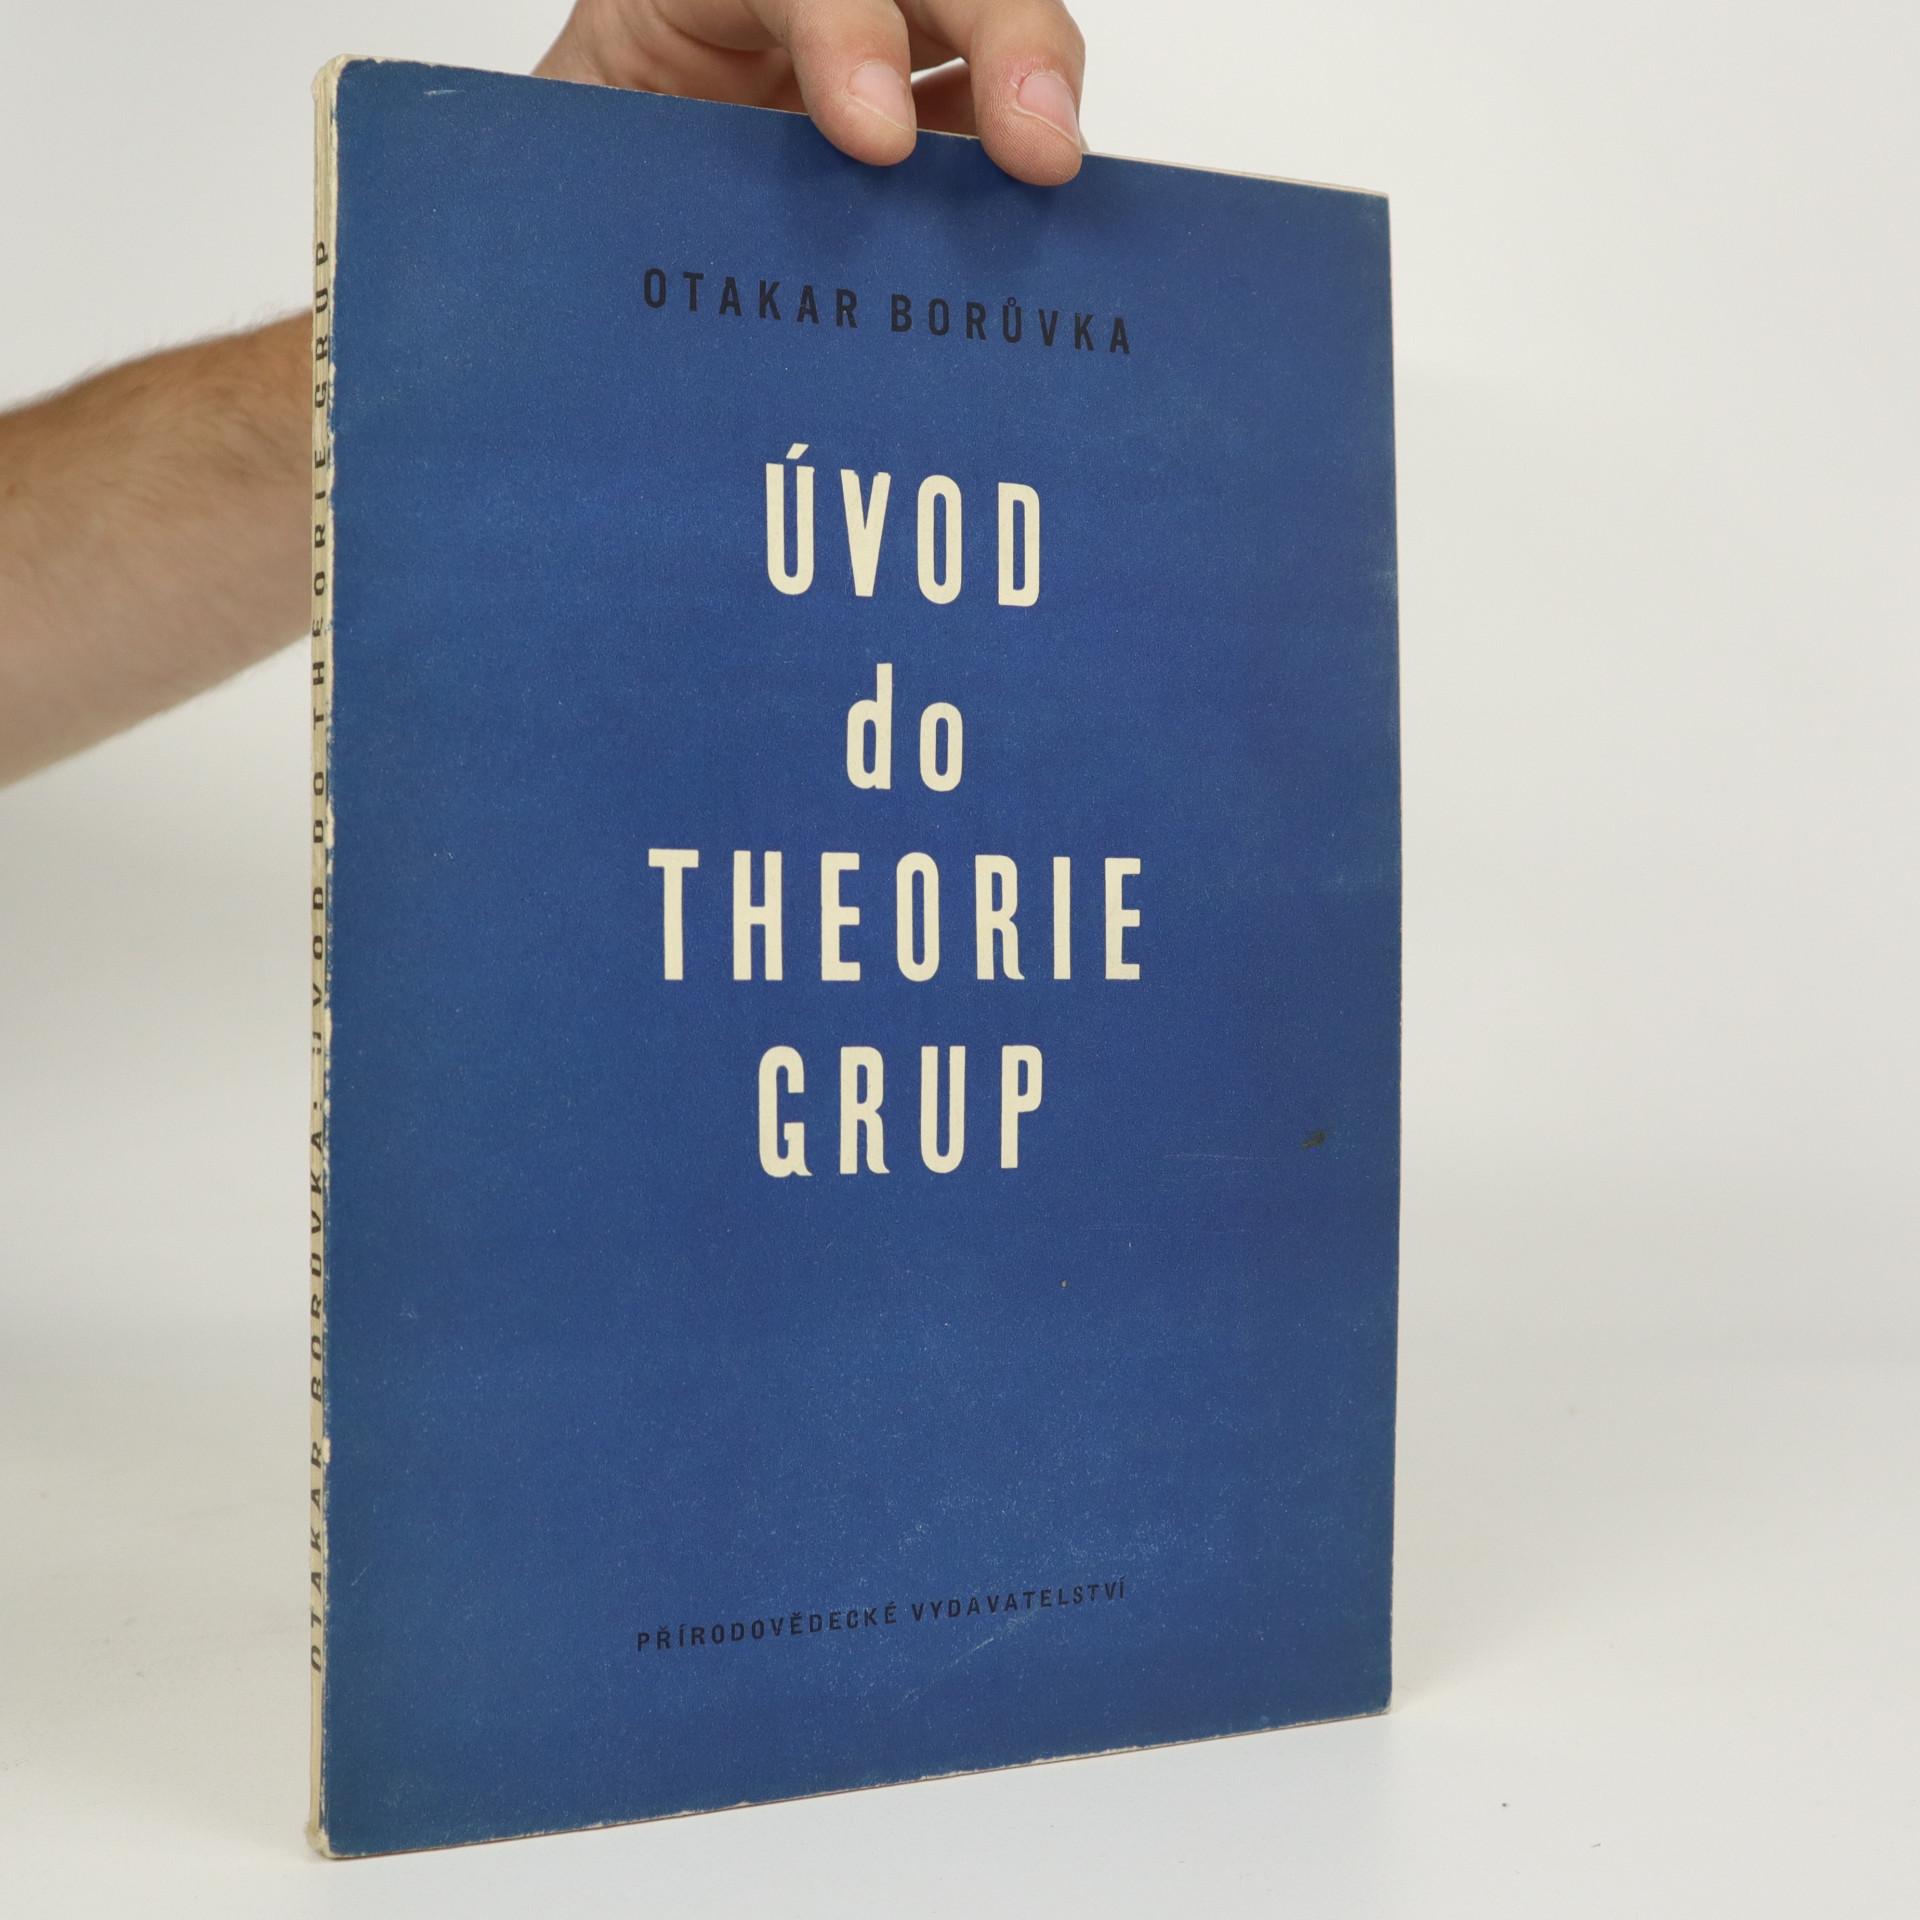 antikvární kniha Úvod do theorie grup, 1952